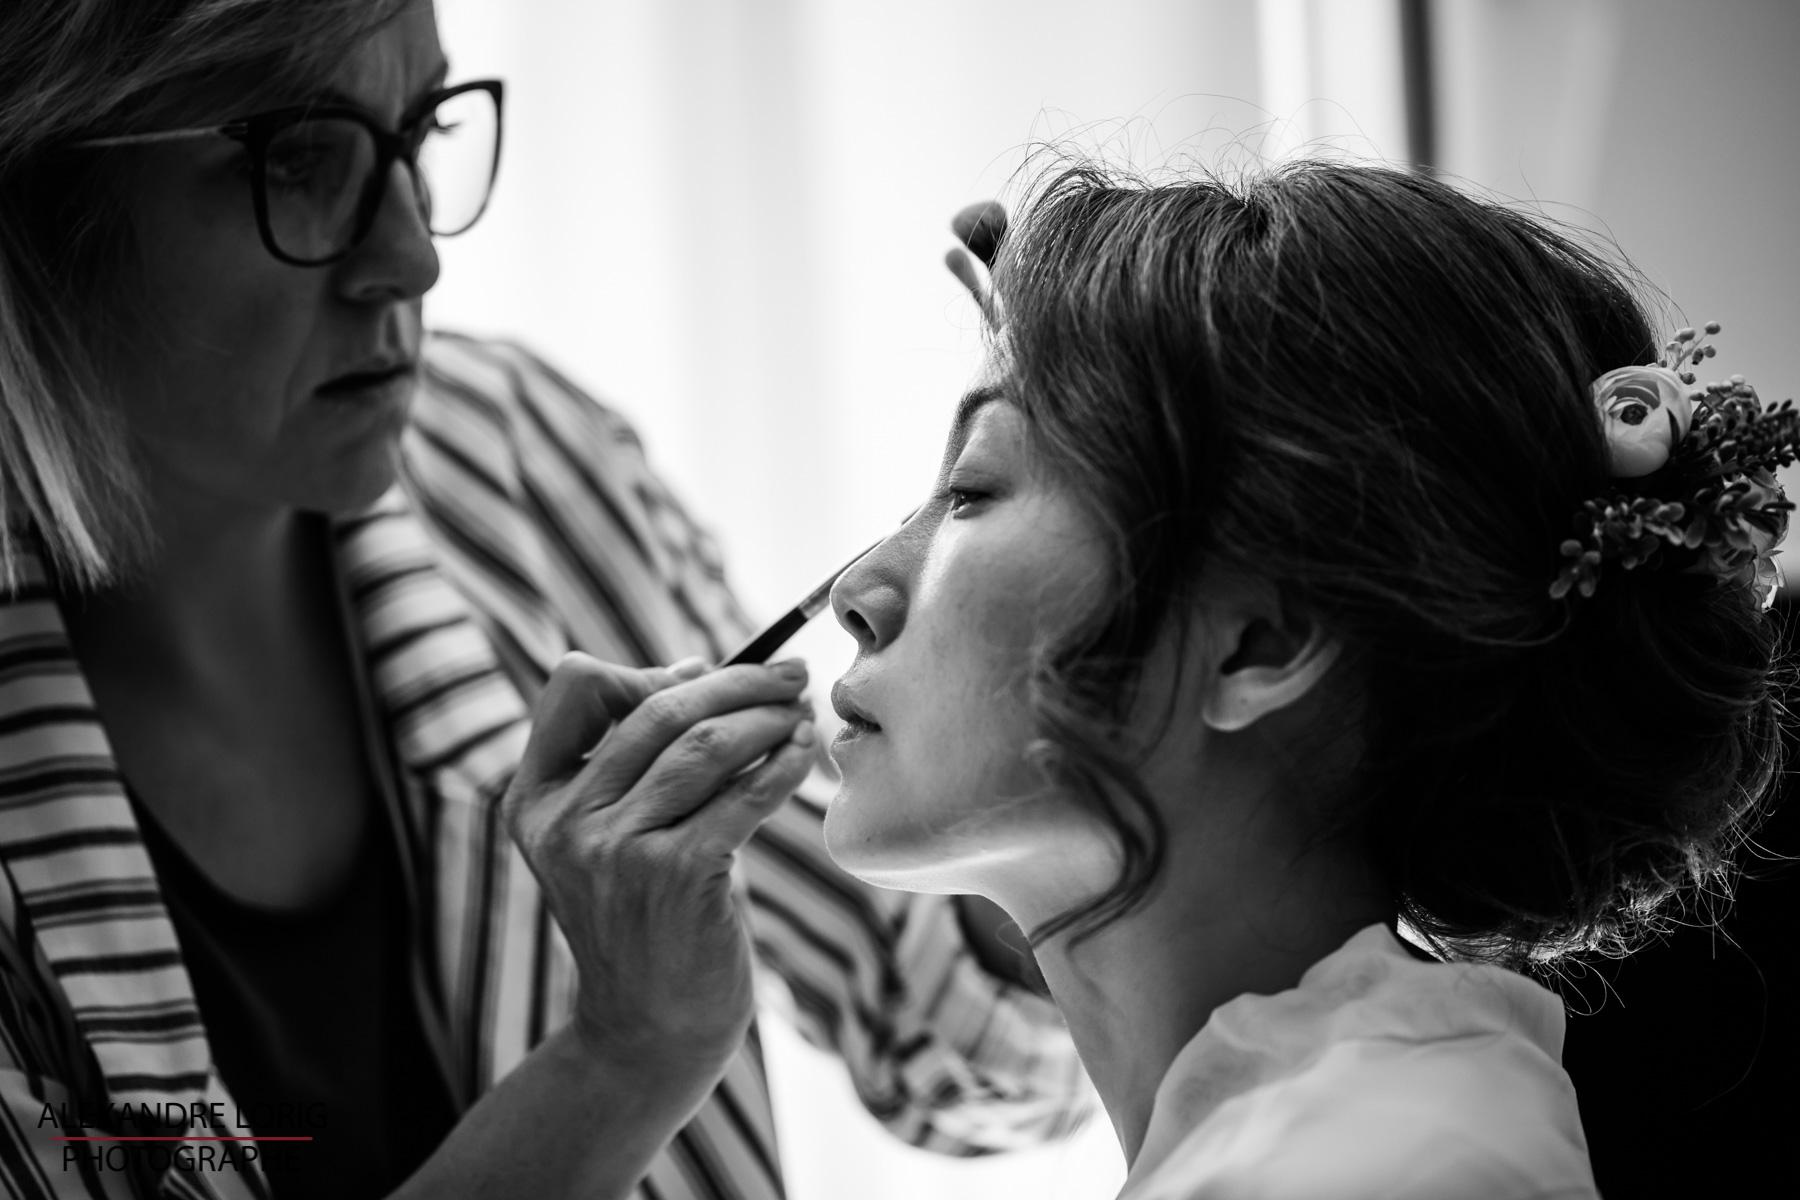 le coeur dans les etoiles - wedding planner provence - luberon - mariage provence - Alexandre Lorig - preparatif mariee